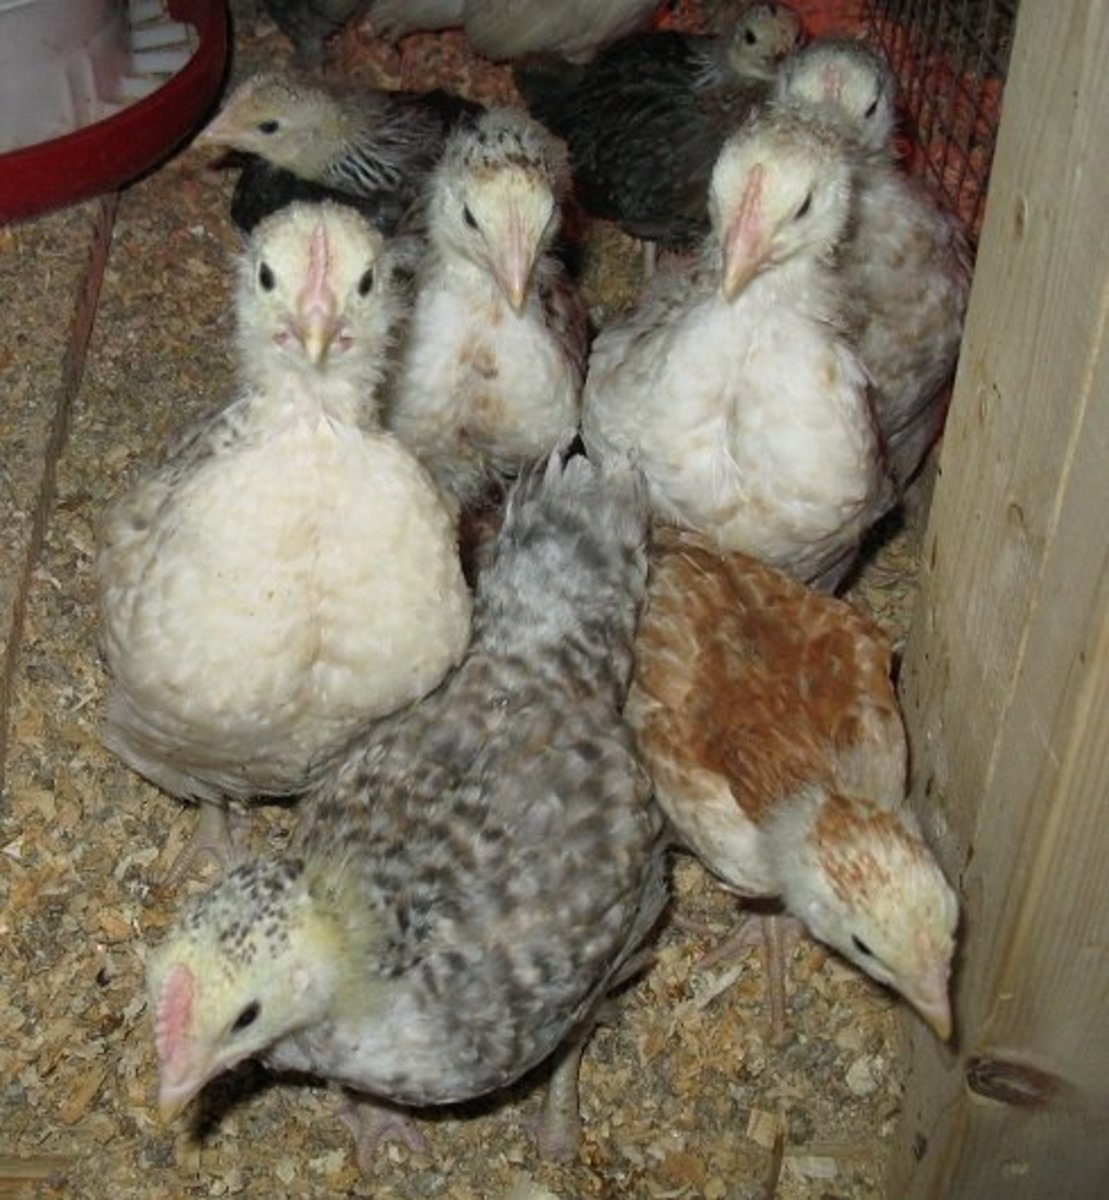 Friendly Euskal Oiloa Chicks in the brooder!